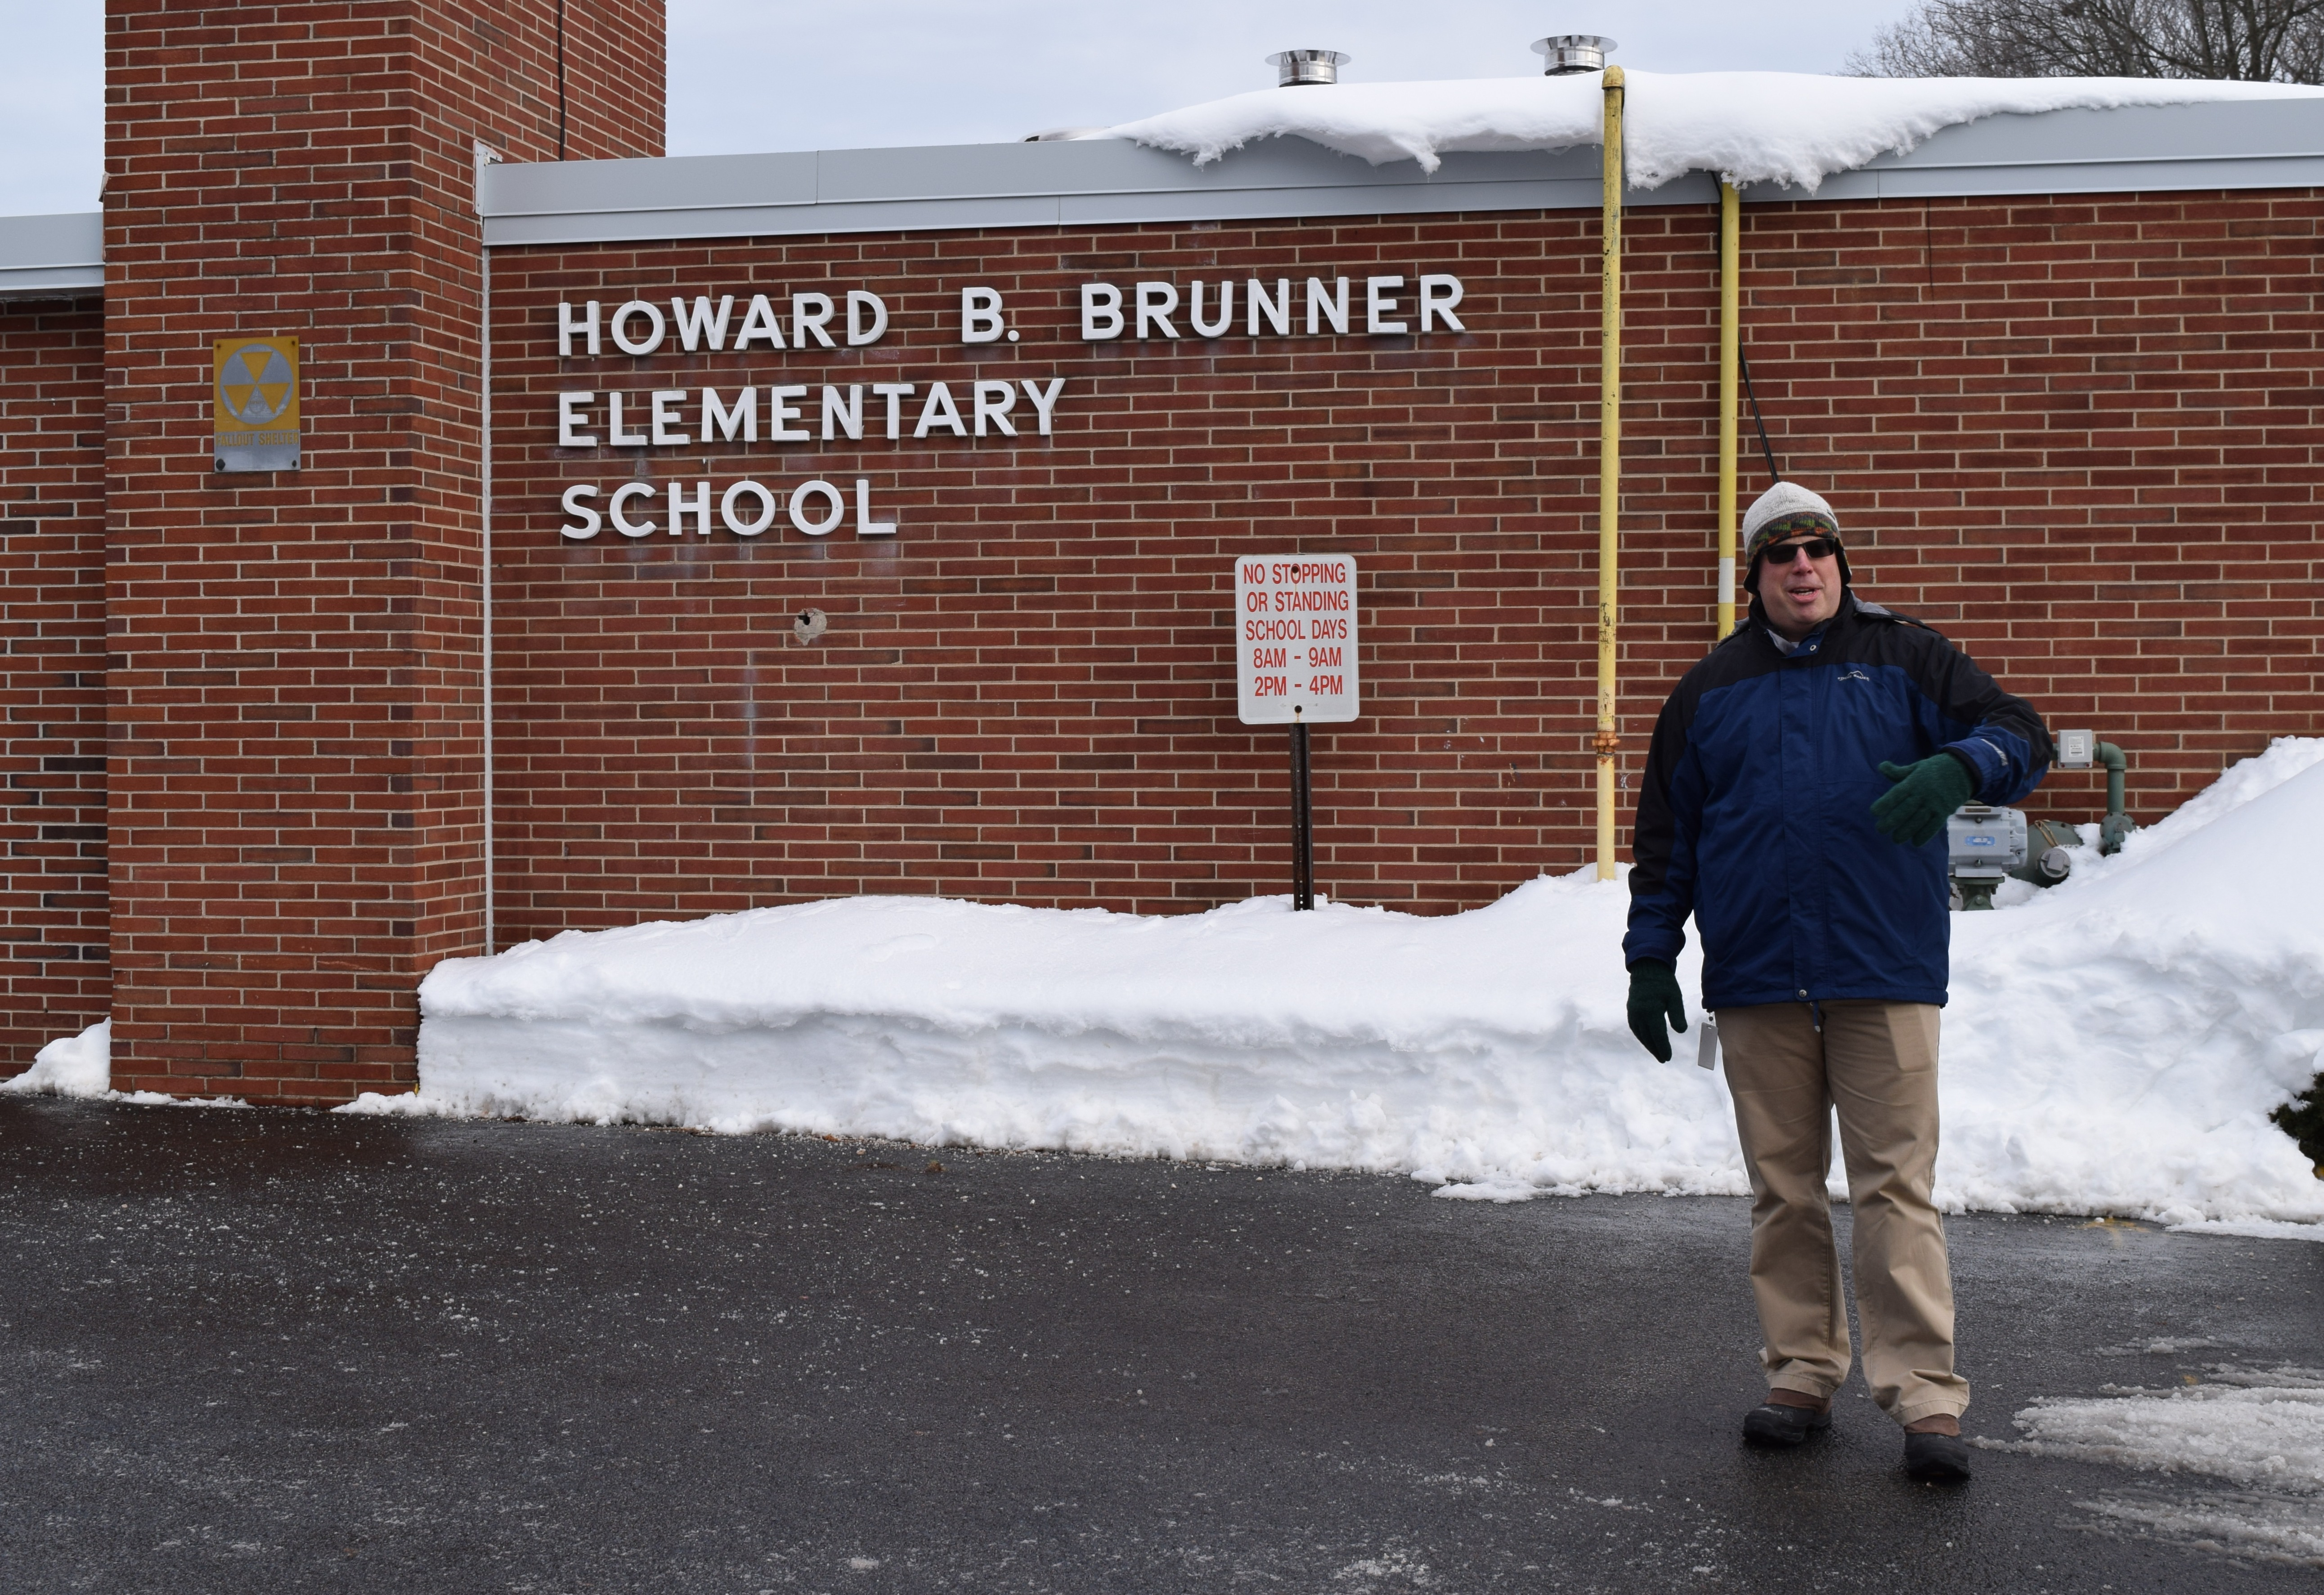 2218024674a98d179a22_1-26_Principal_Scott_Bortnick_welcomes_students_back_to_Brunner_School.JPG